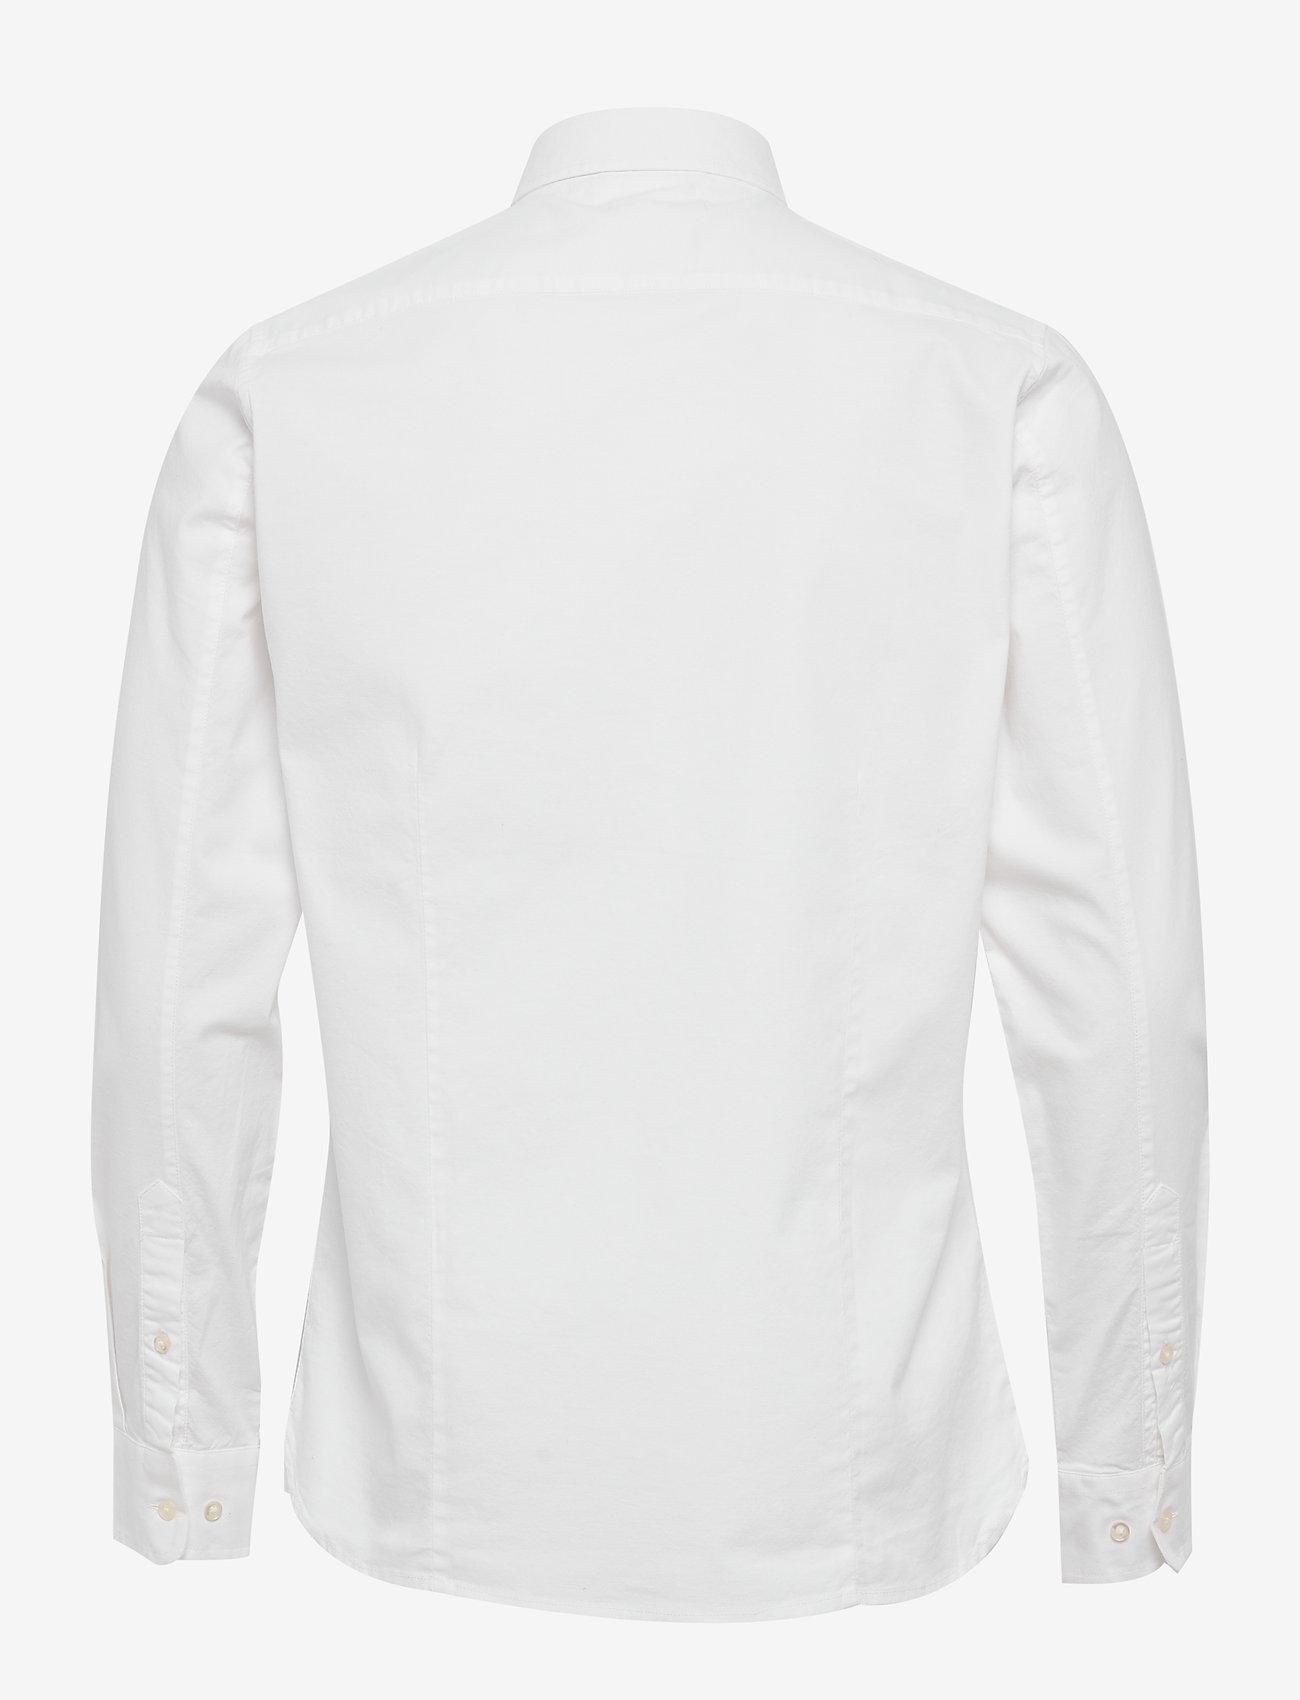 Elder Regular Fit Small Embr. Owl O (Bright White) (63.96 €) - Knowledge Cotton Apparel OQ2Rz